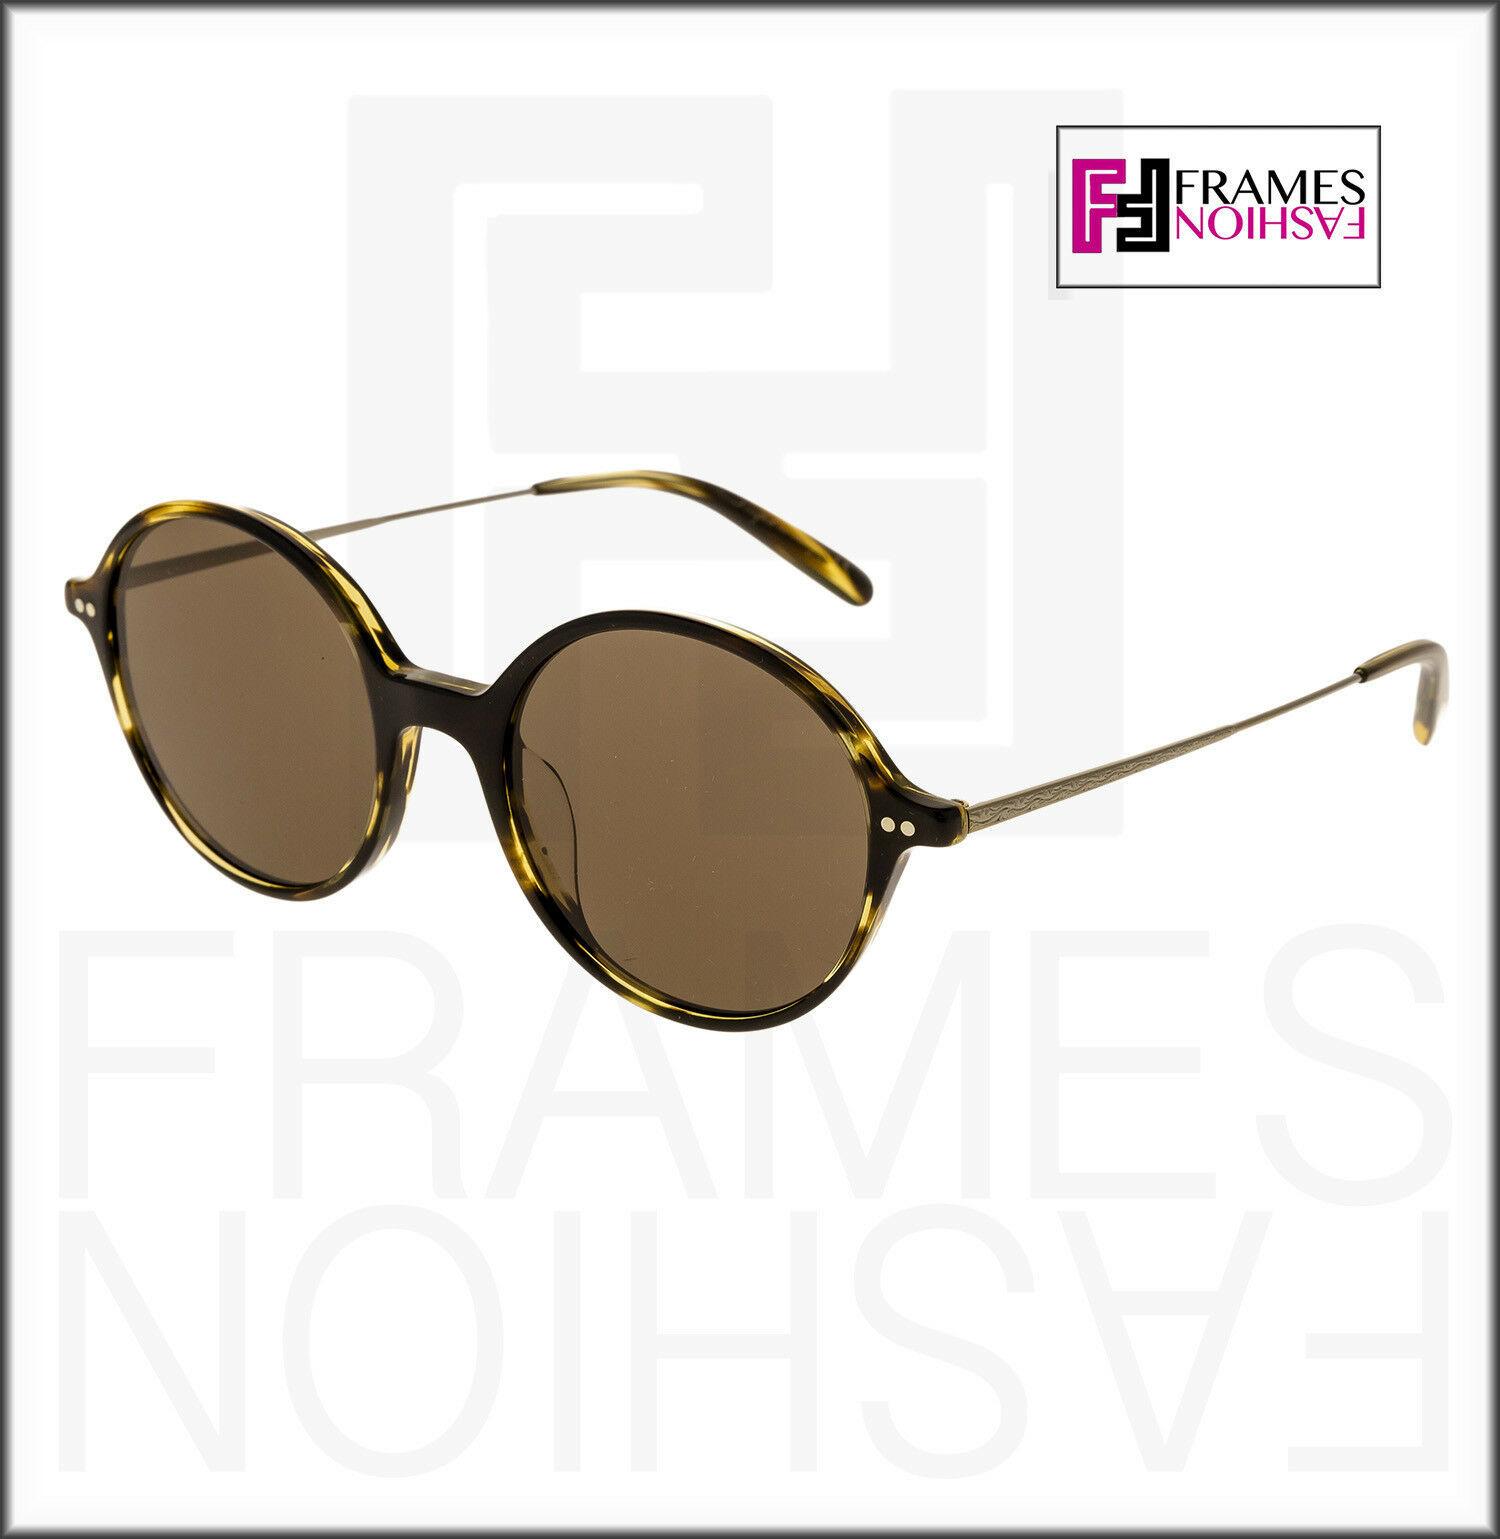 OLIVER PEOPLES CORBY OV5347SU Cocobolo Brown Gold Round Sunglasses 5347 Unisex image 7